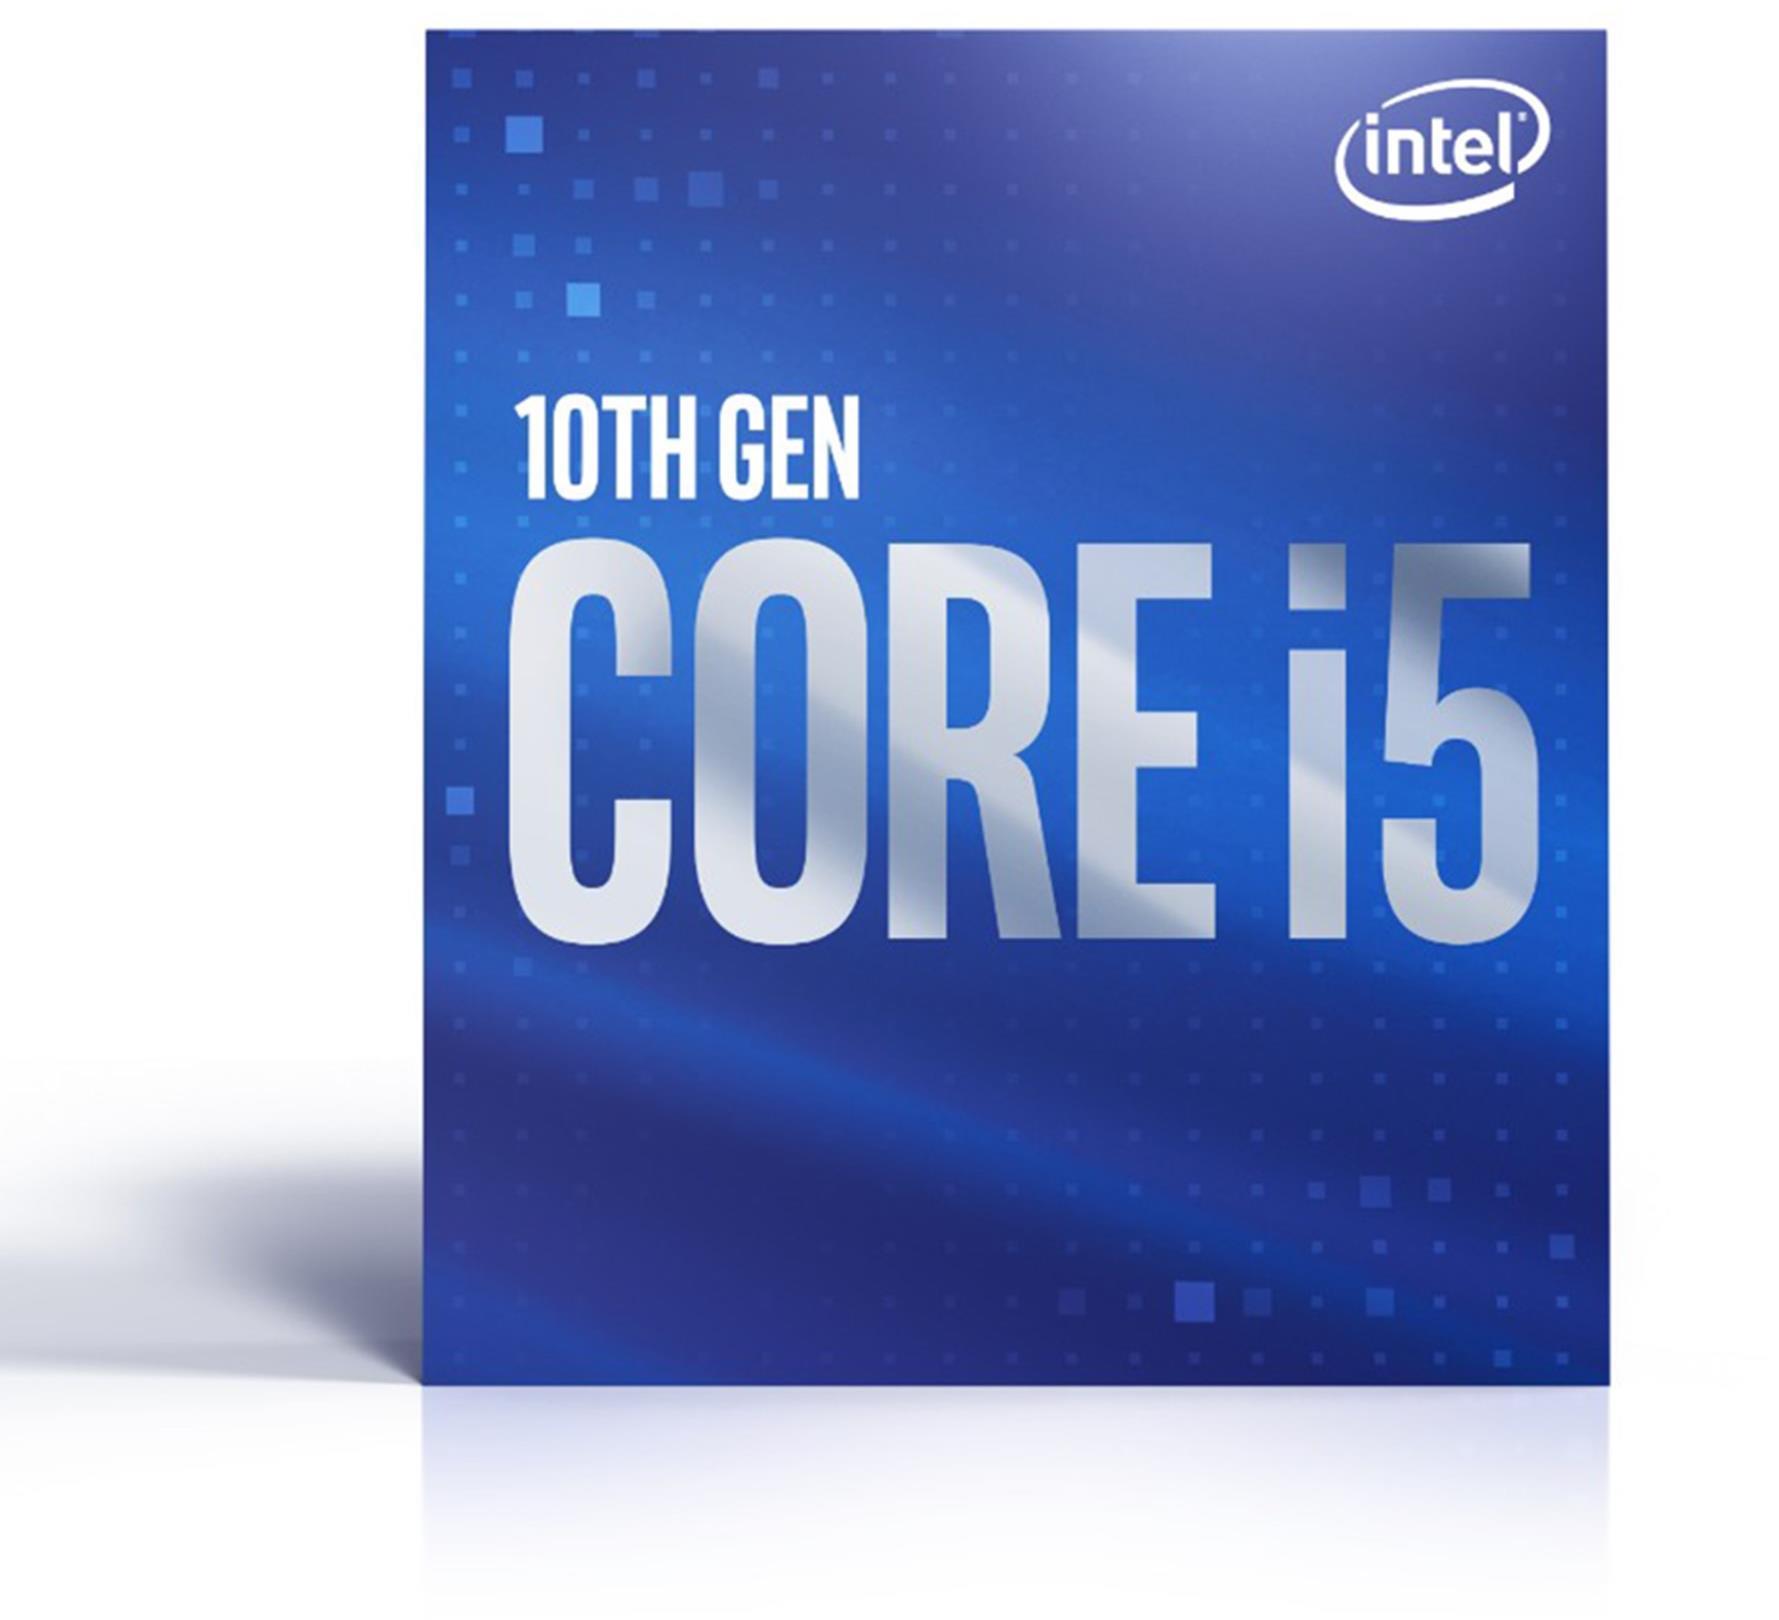 Microprocesador Intel Core I5 10400F Cometlake 6/12 4.3Ghz 12Mb S1200